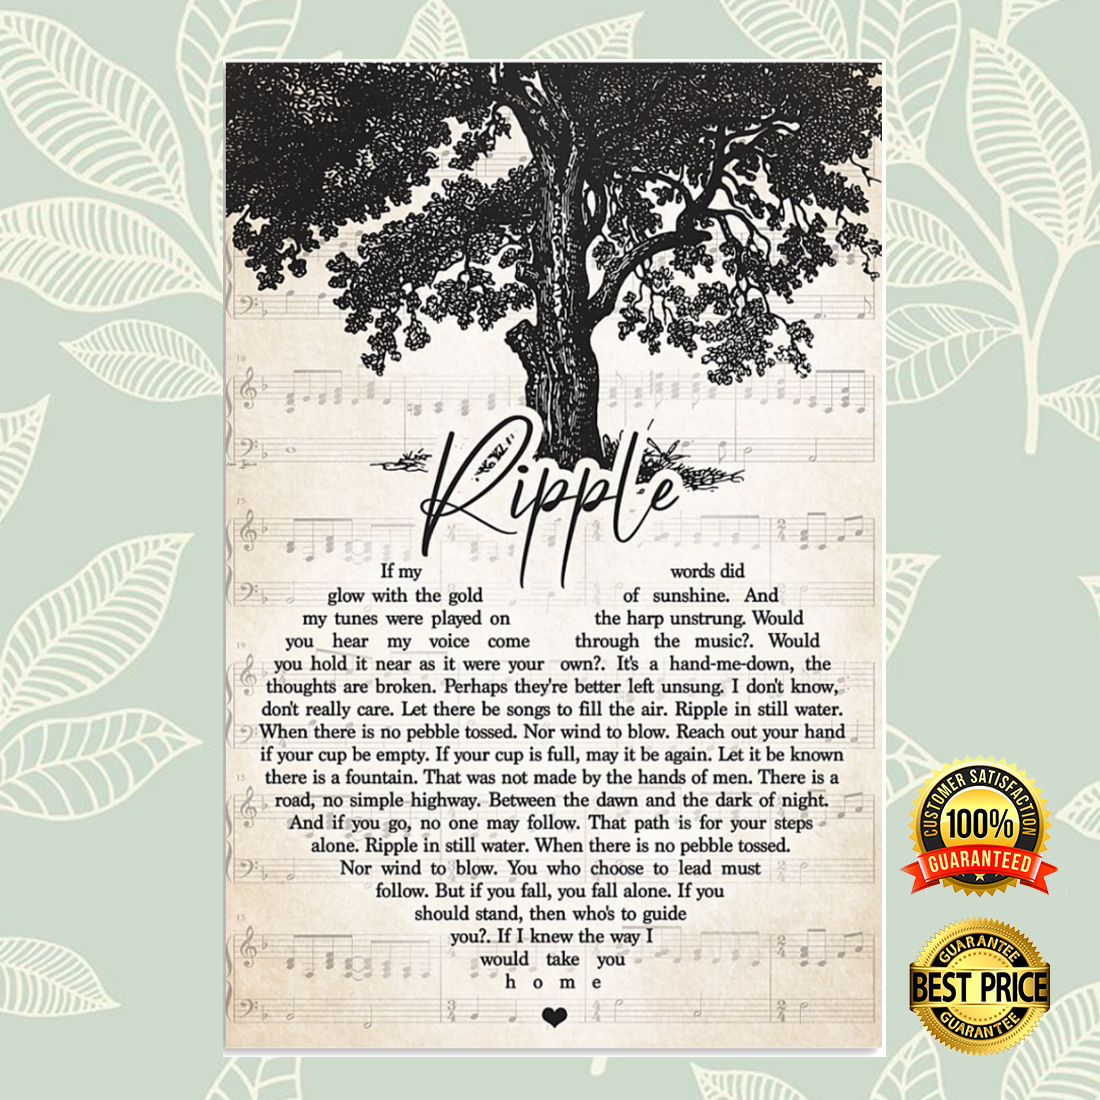 Ripple heart song lyric poster 6